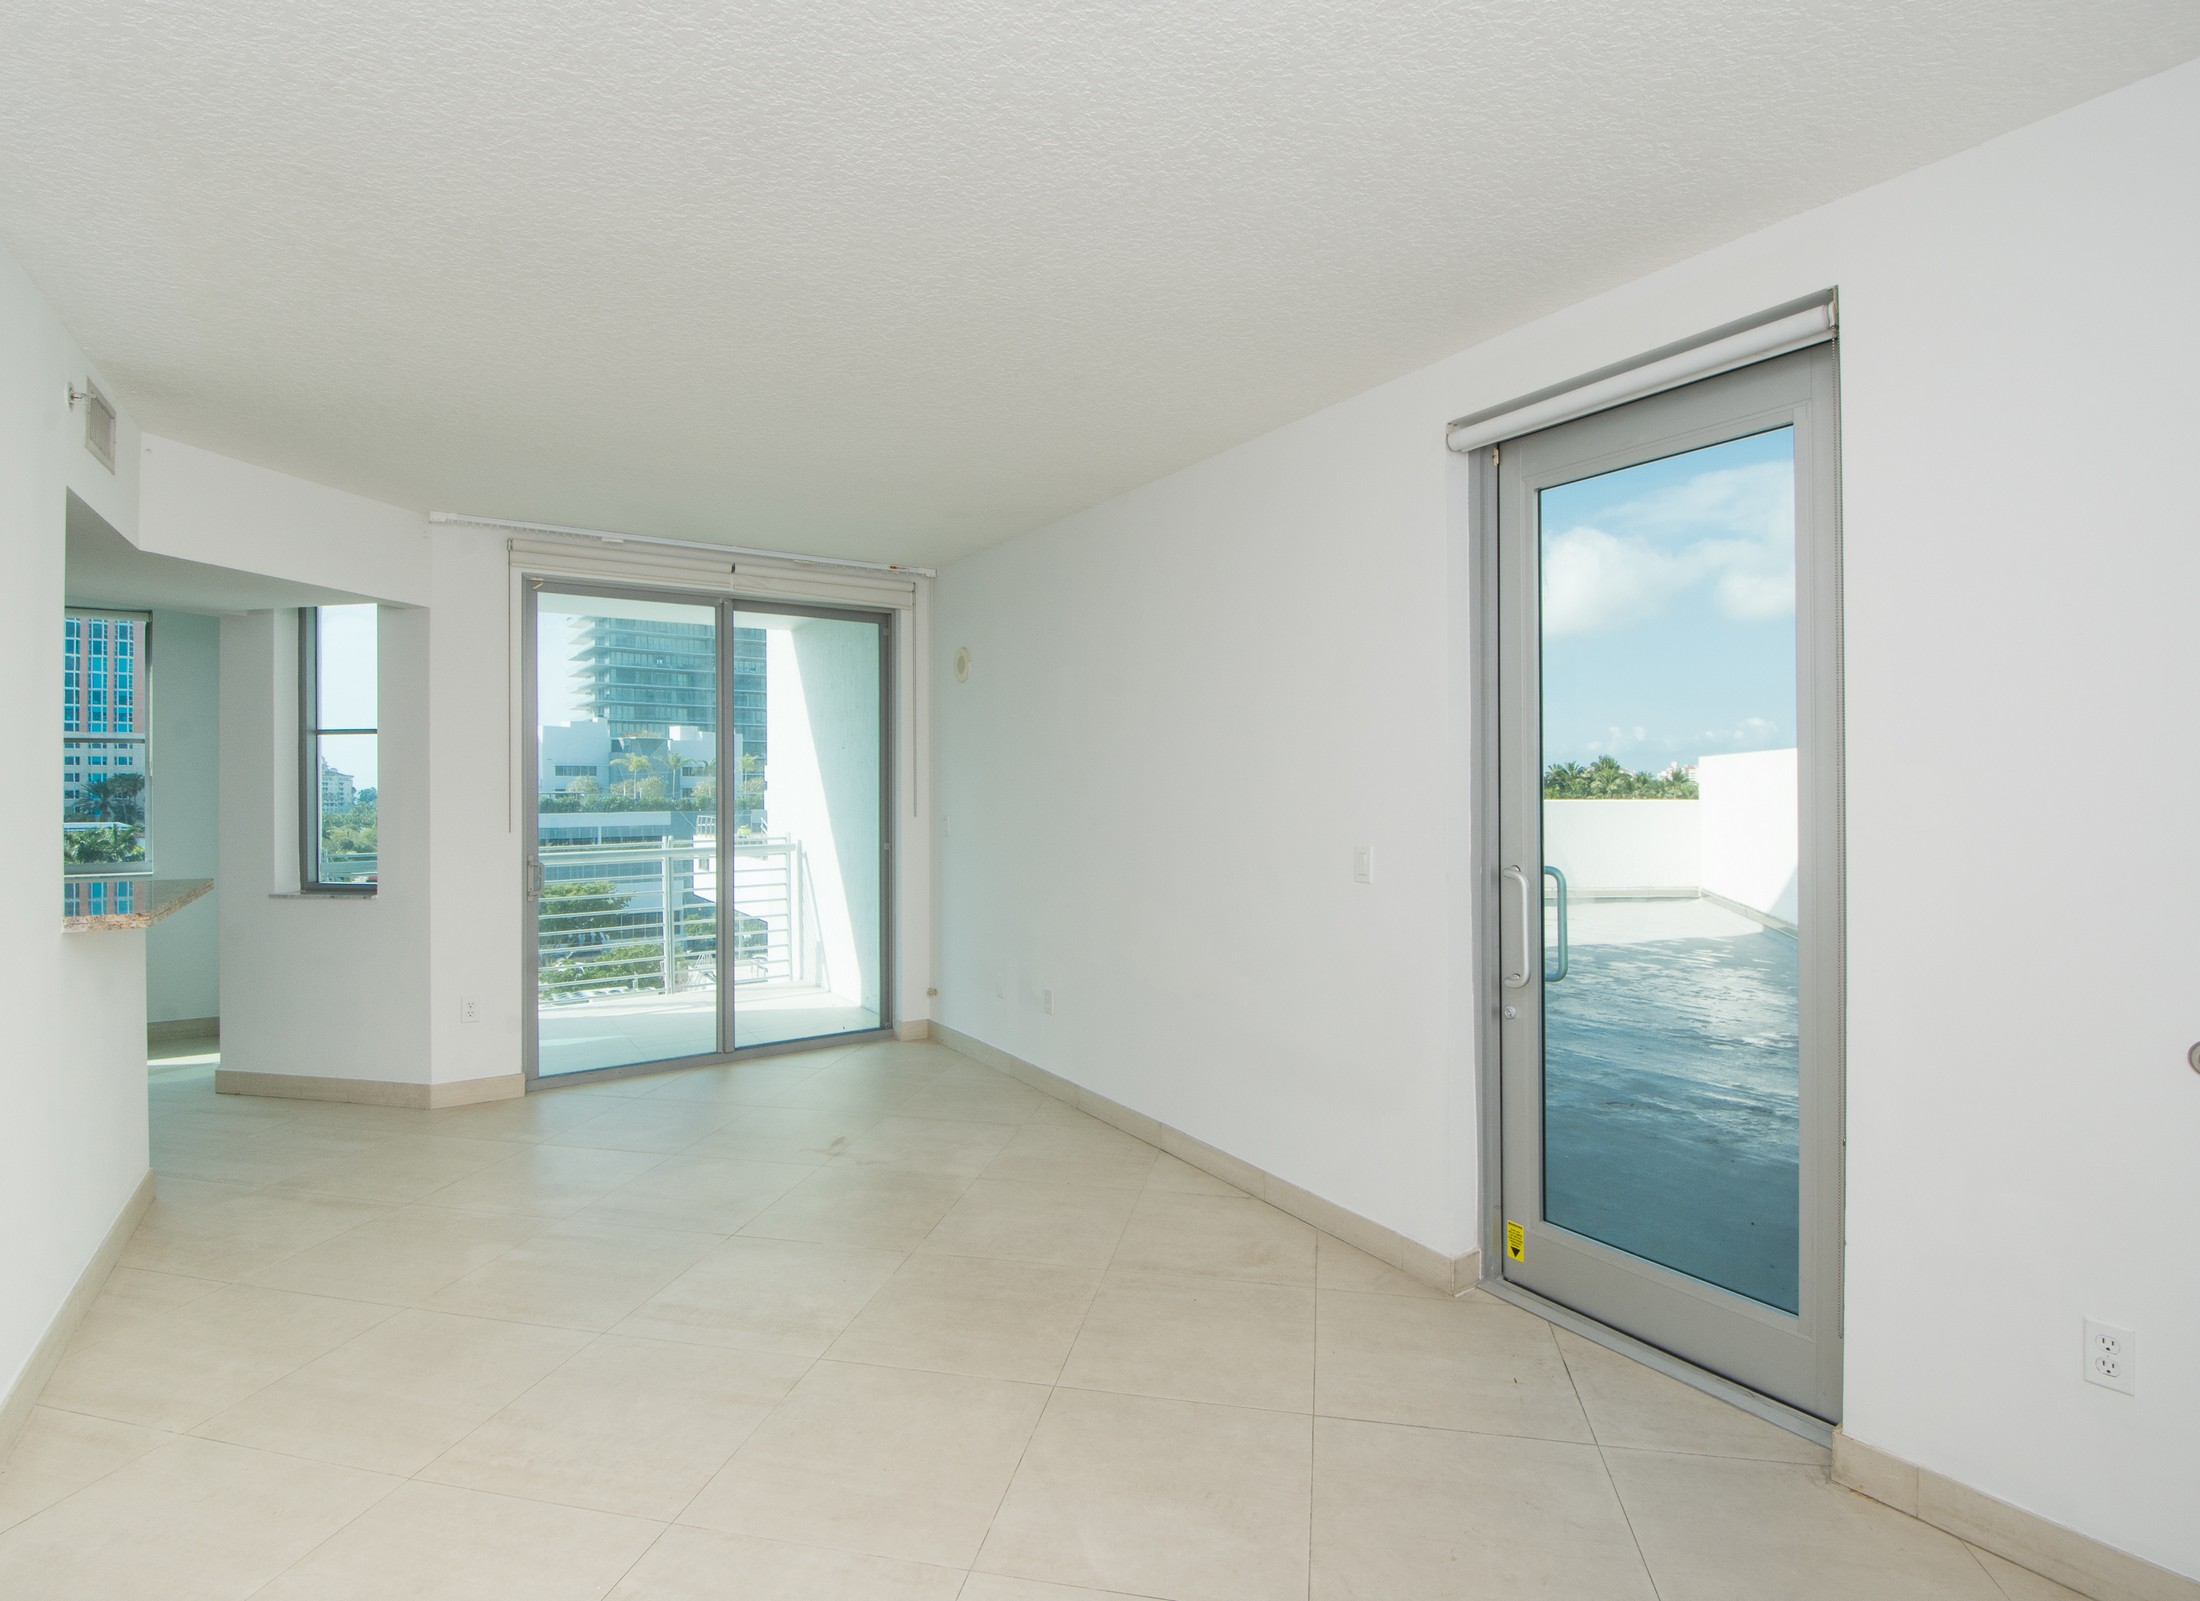 Condominium for Sale at 110 Washington Ave #1713 110 Washington Ave 1713 Miami Beach, Florida, 33139 United States